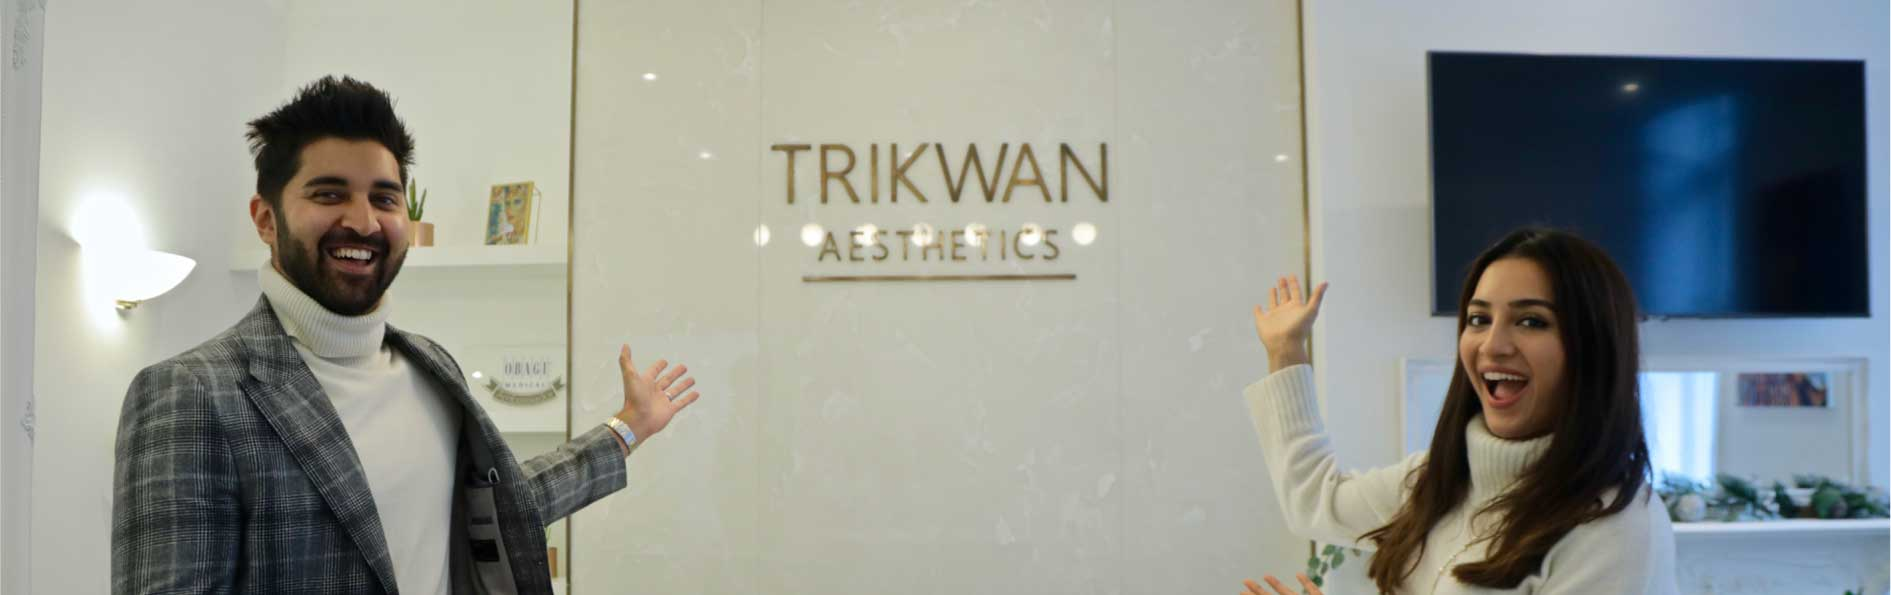 Why Trikwan?